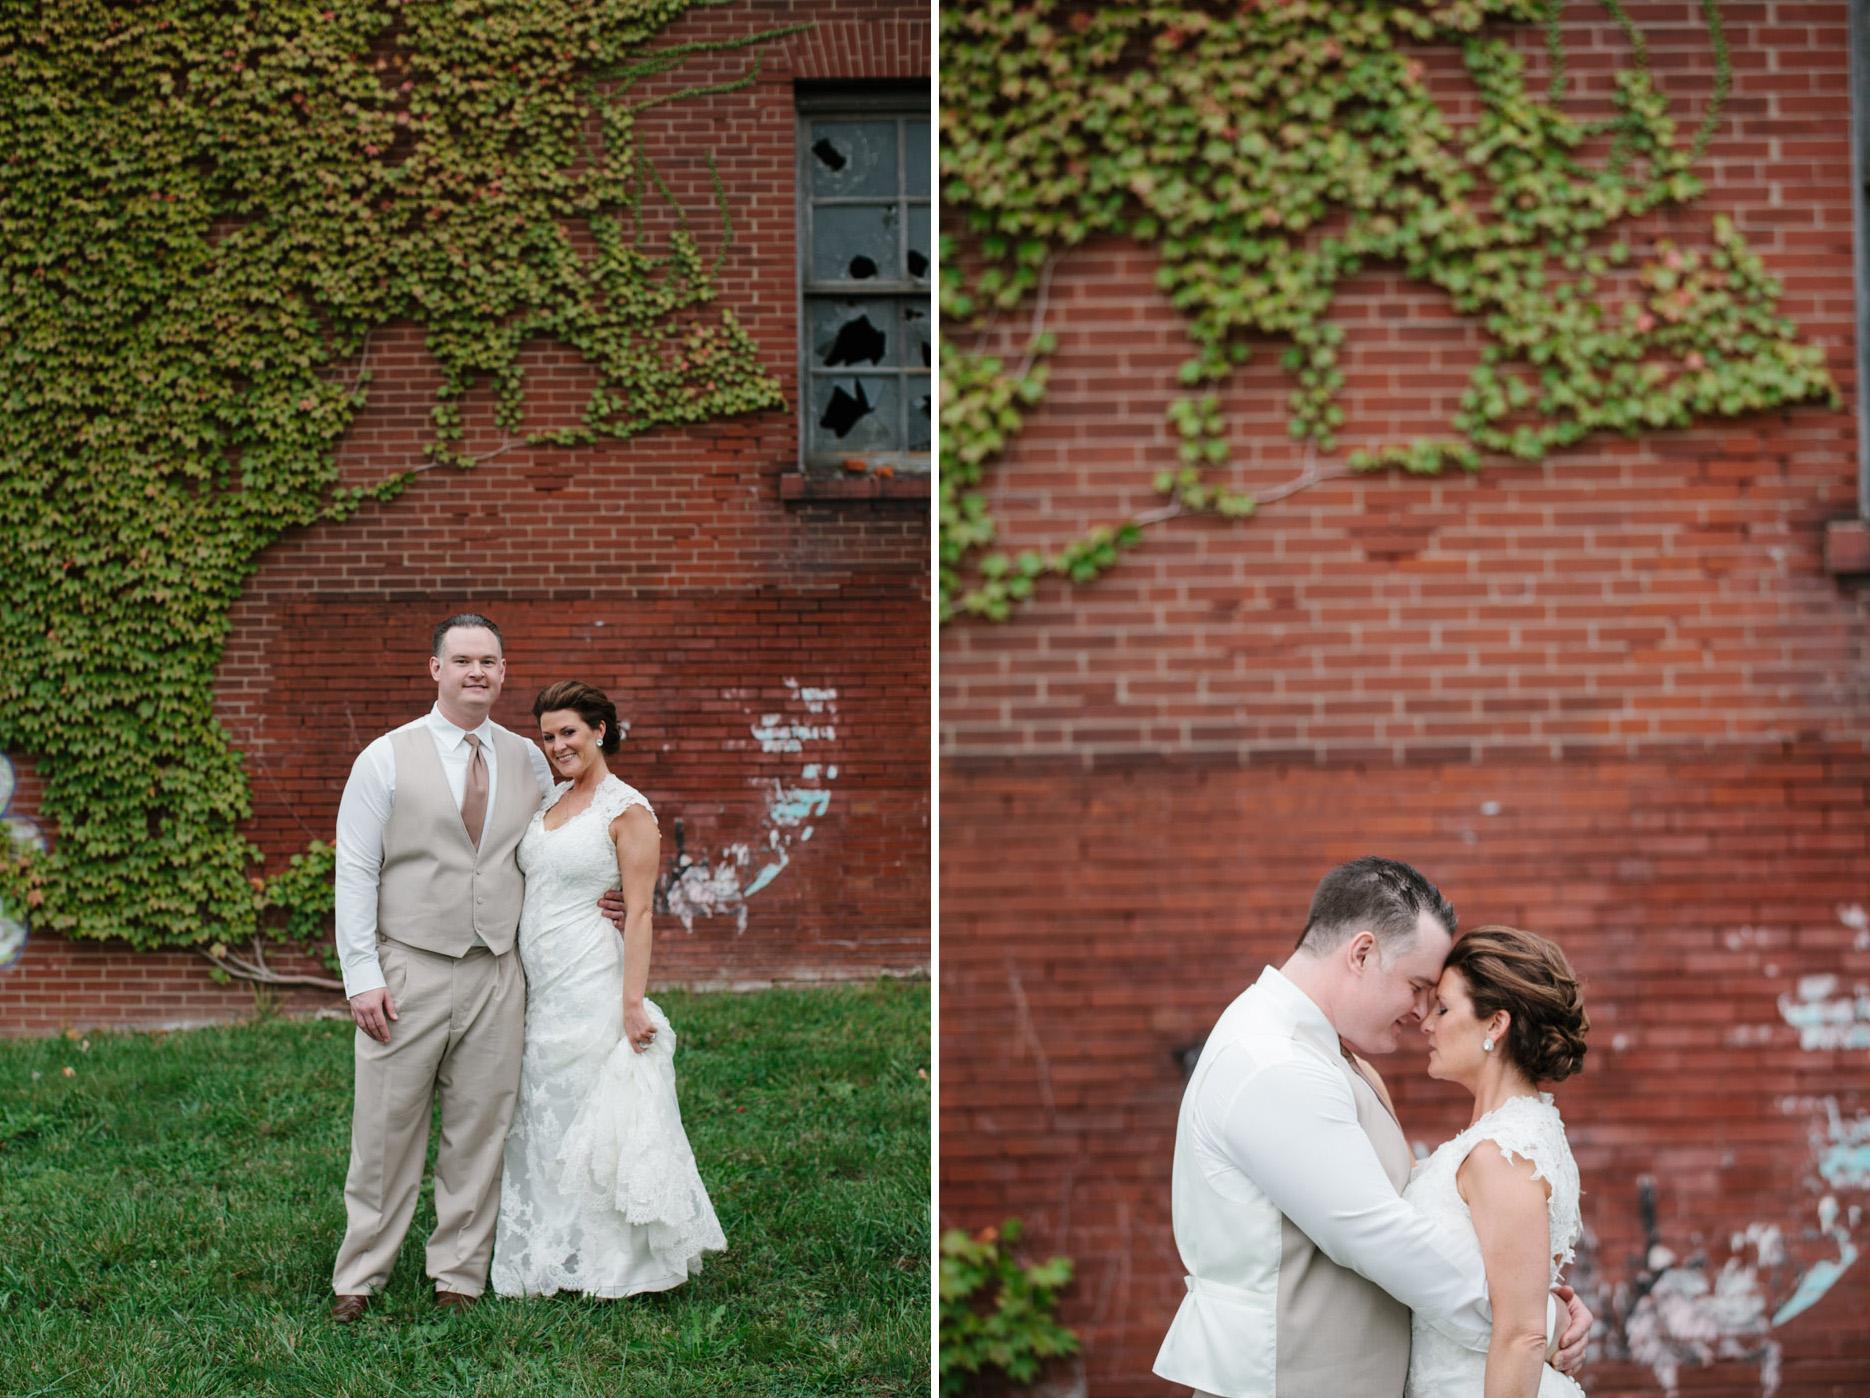 St-Louis-Wedding-Photography-1065-copy.jpg